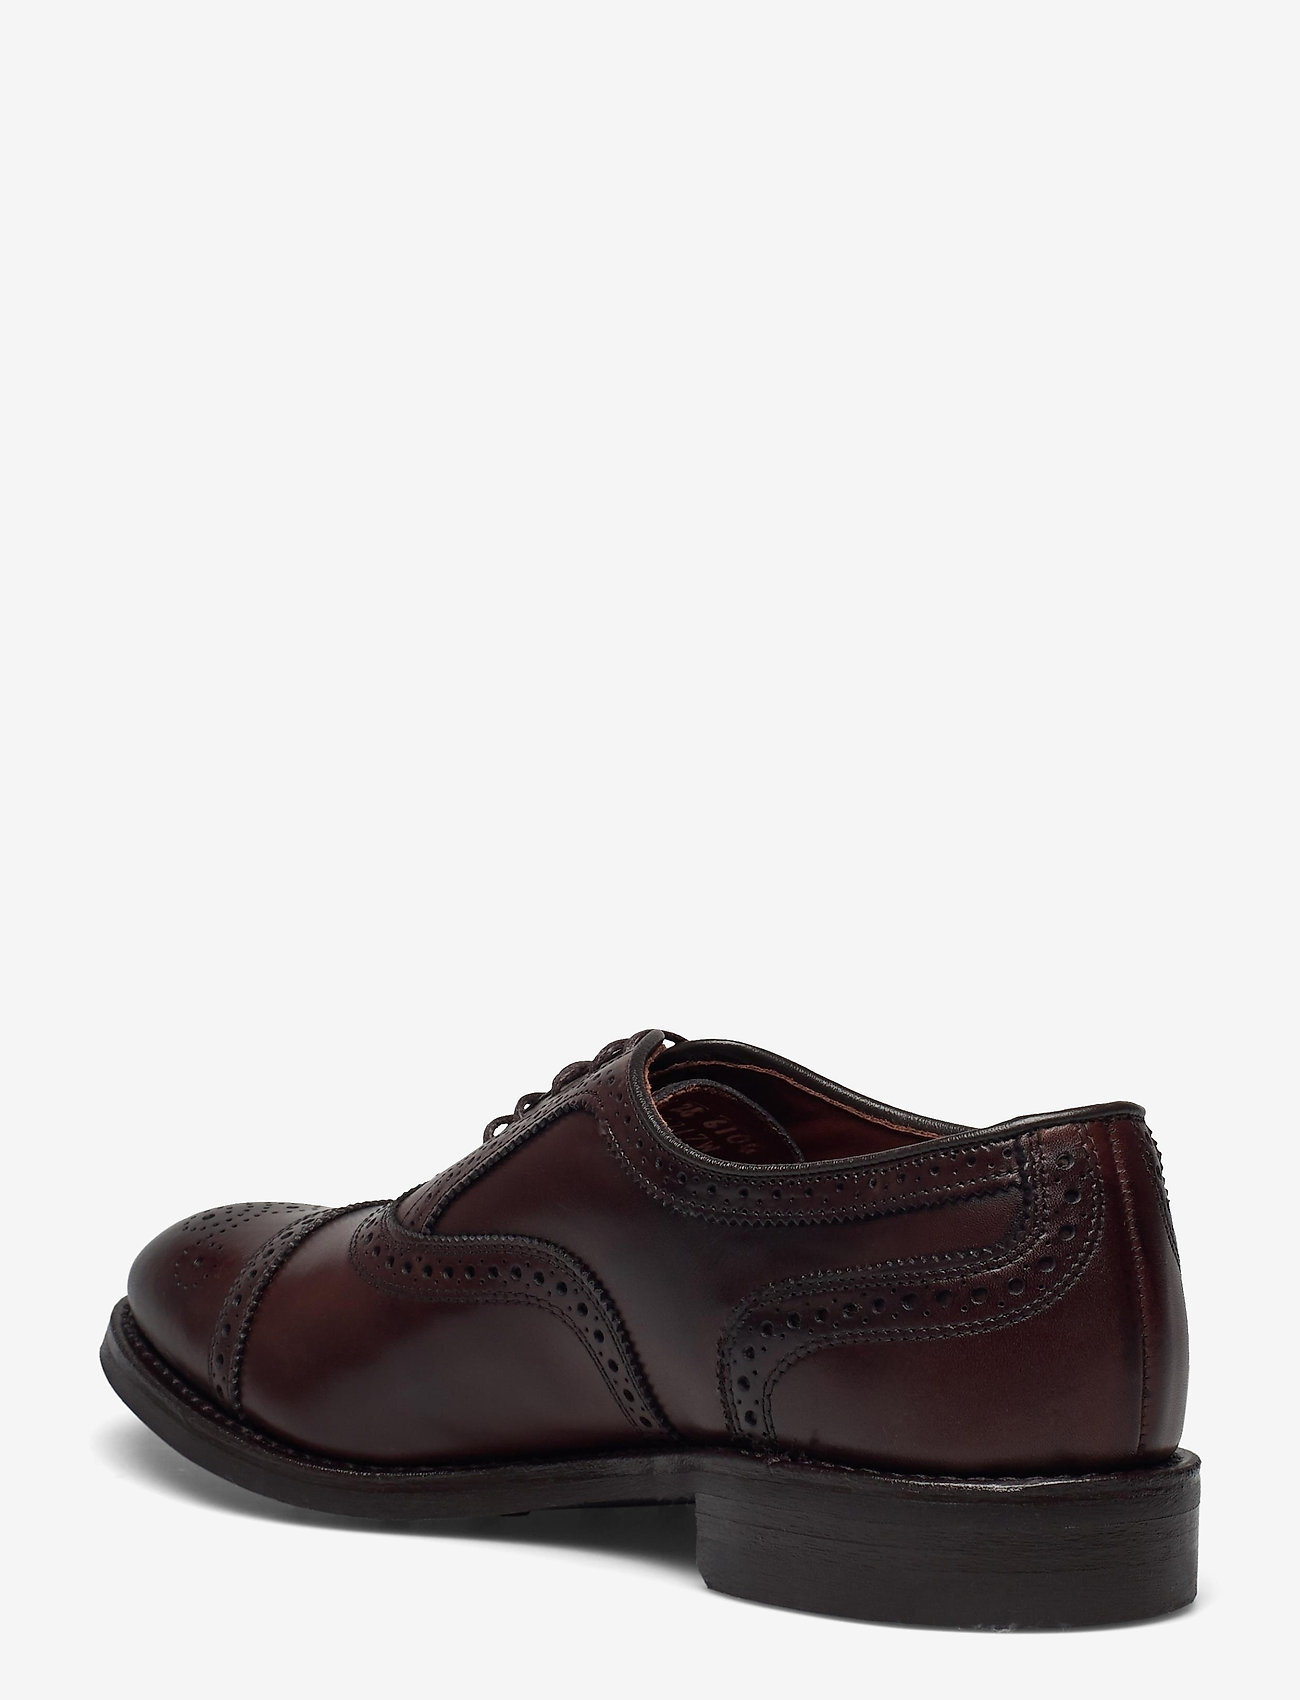 Allen Edmonds - Strand /Dainite Sole - business - brown - 2